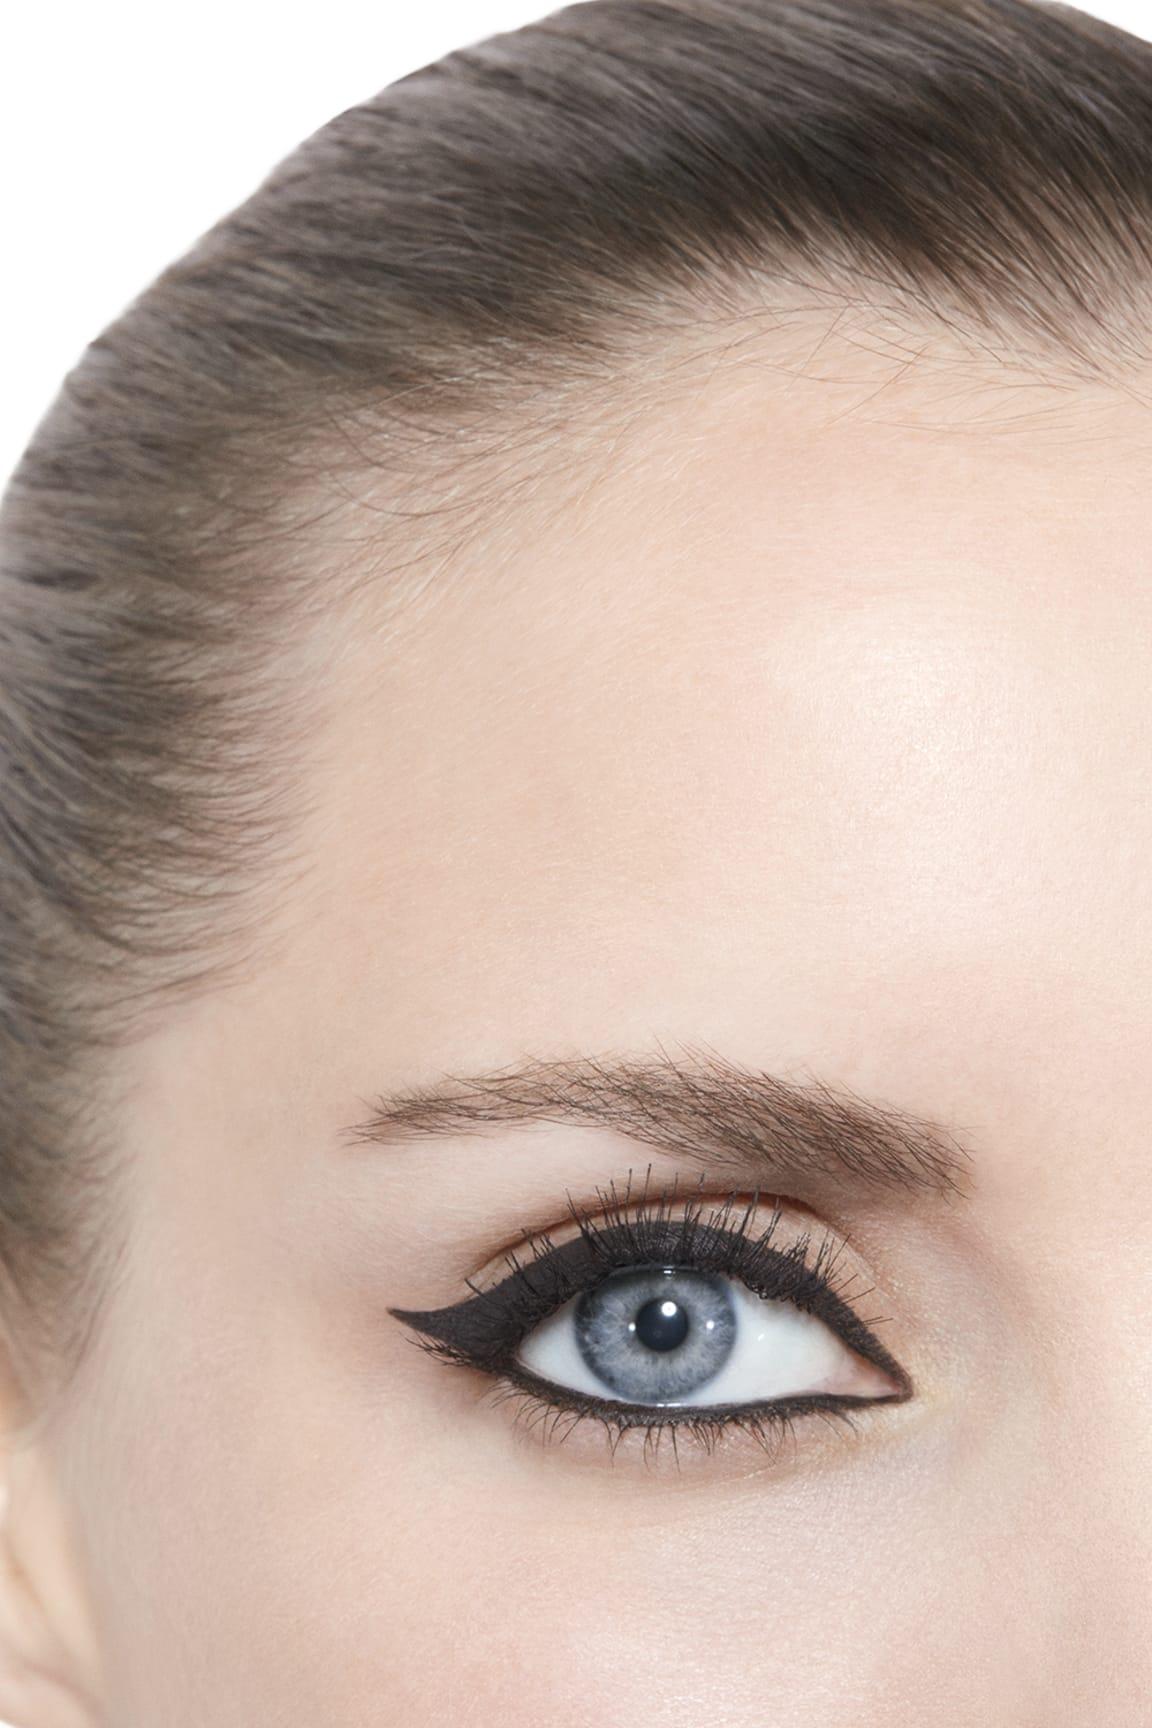 Application makeup visual 3 - CALLIGRAPHIE DE CHANEL 65 - HYPERBLACK